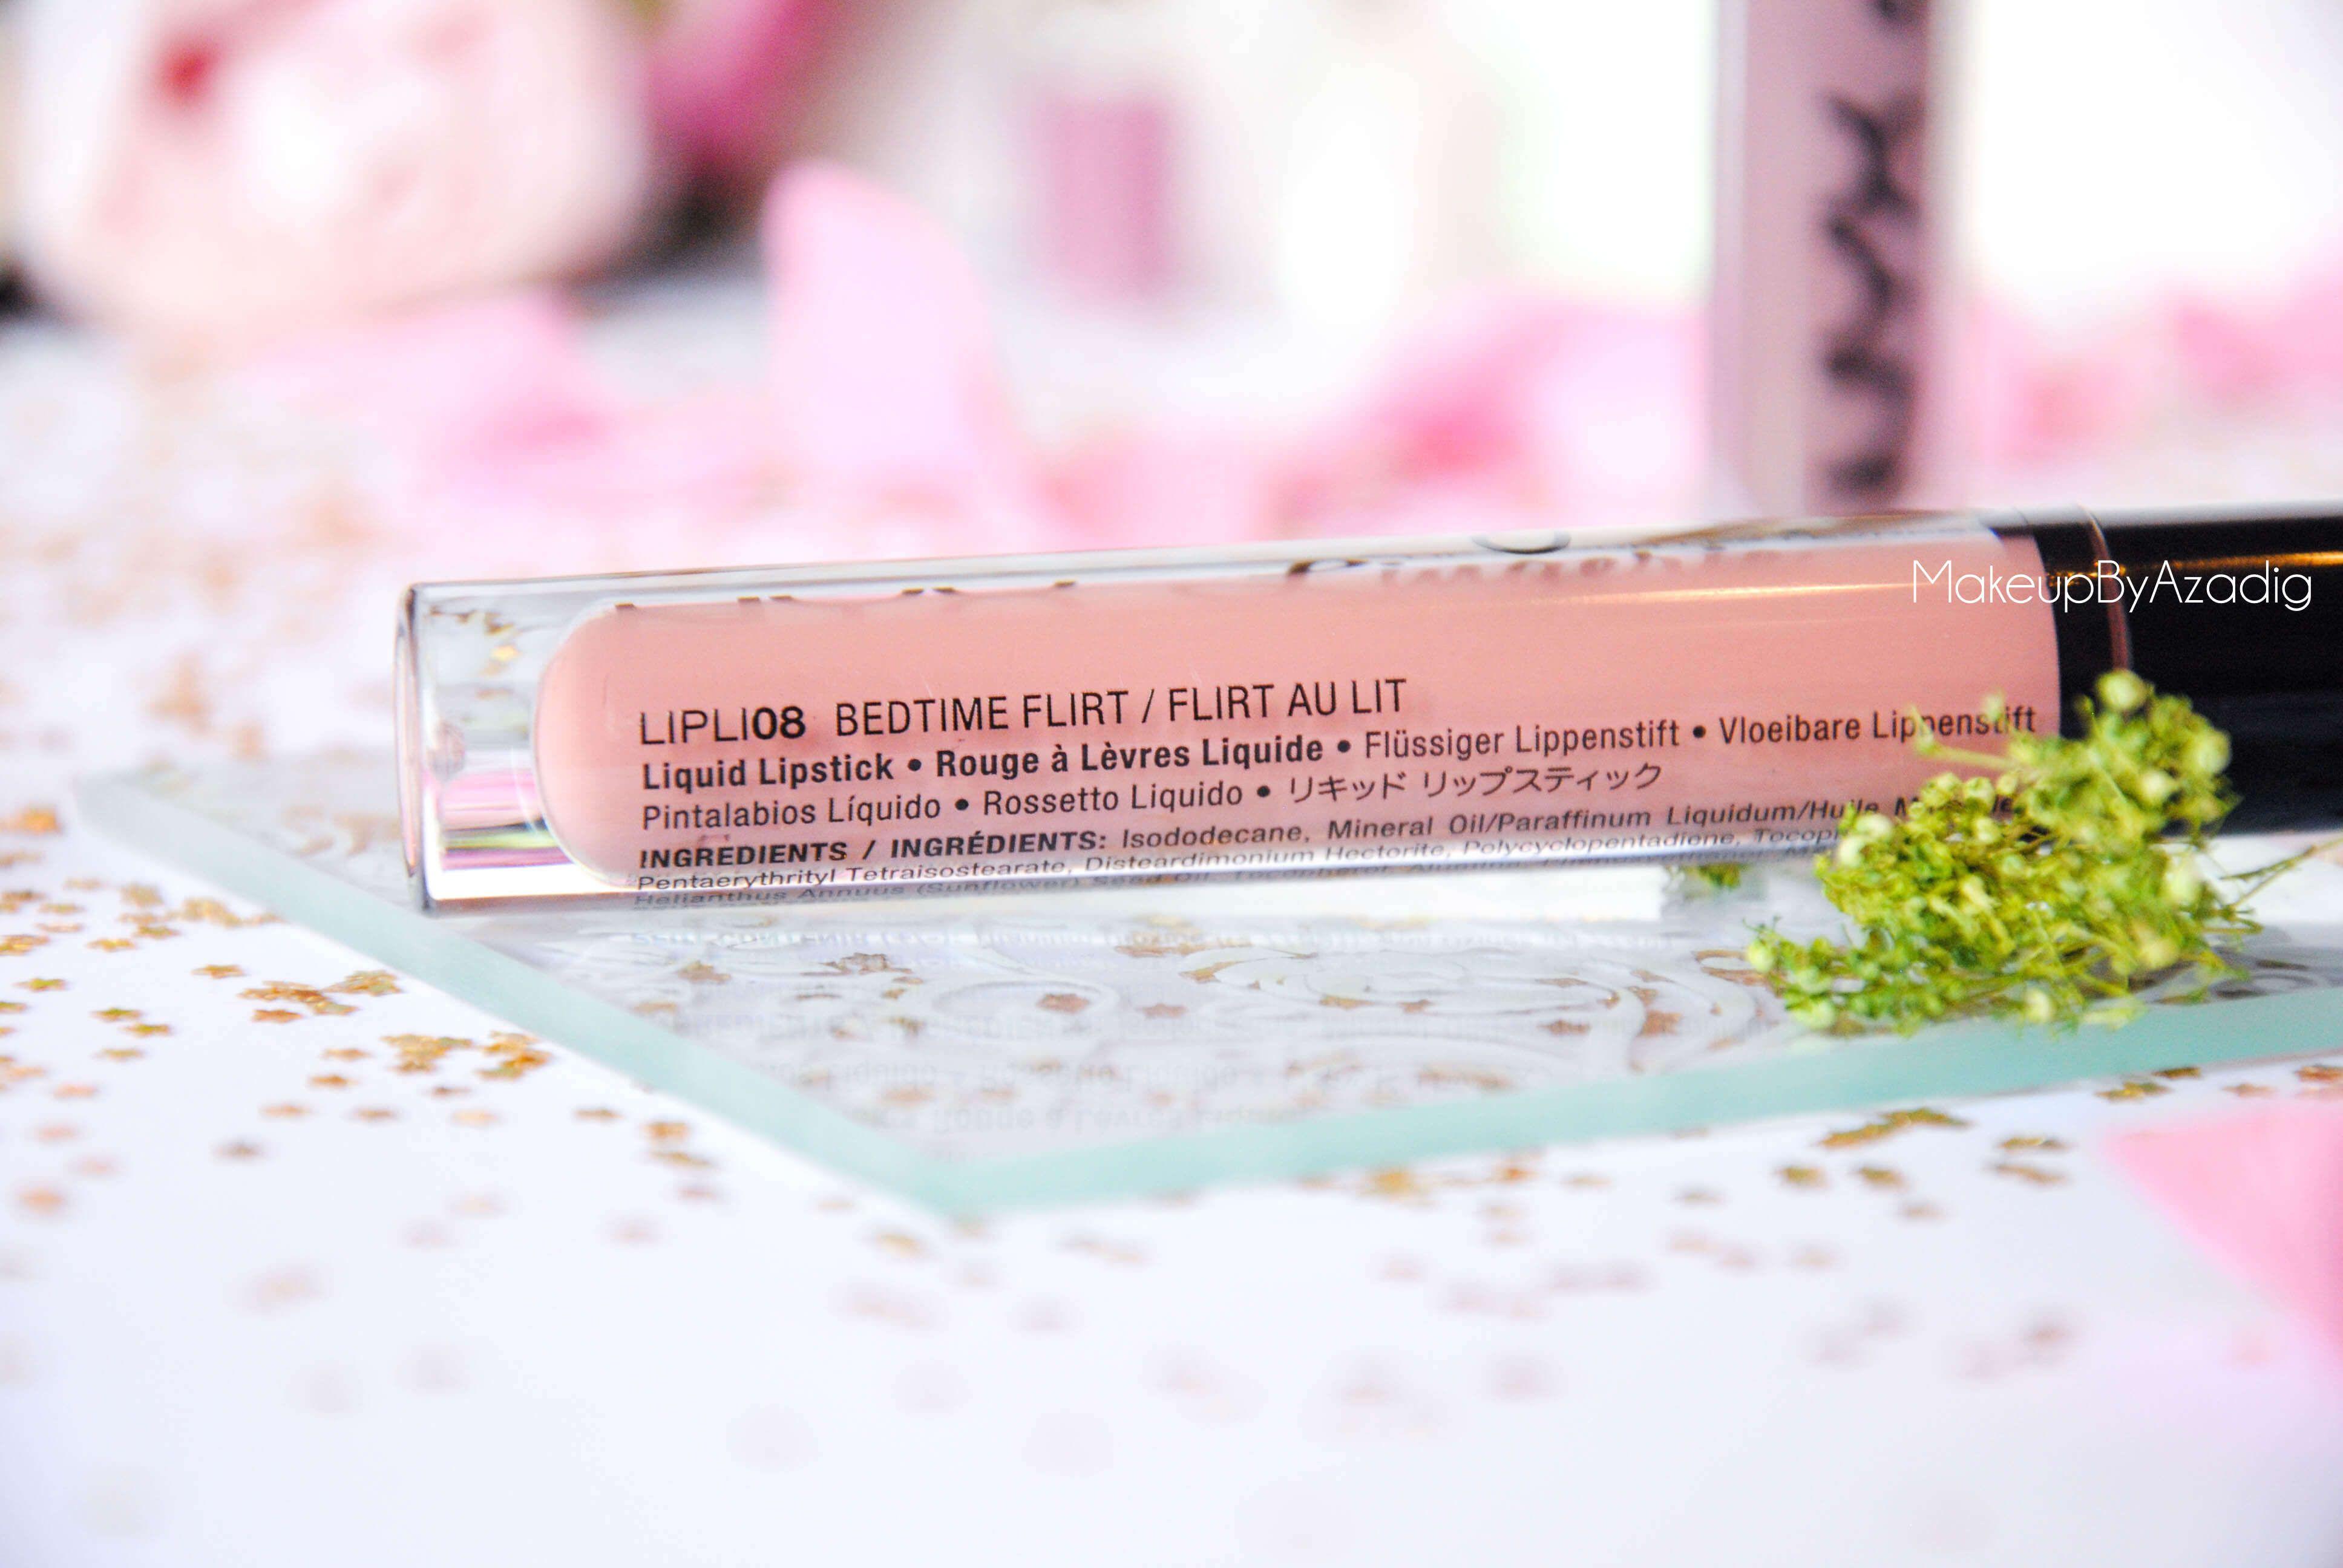 lip lingerie - revue - swatch- nyx cosmetics - embellishment - bedtime flirt - makeupbyazadig - enjoyphoenix - troyes - 08